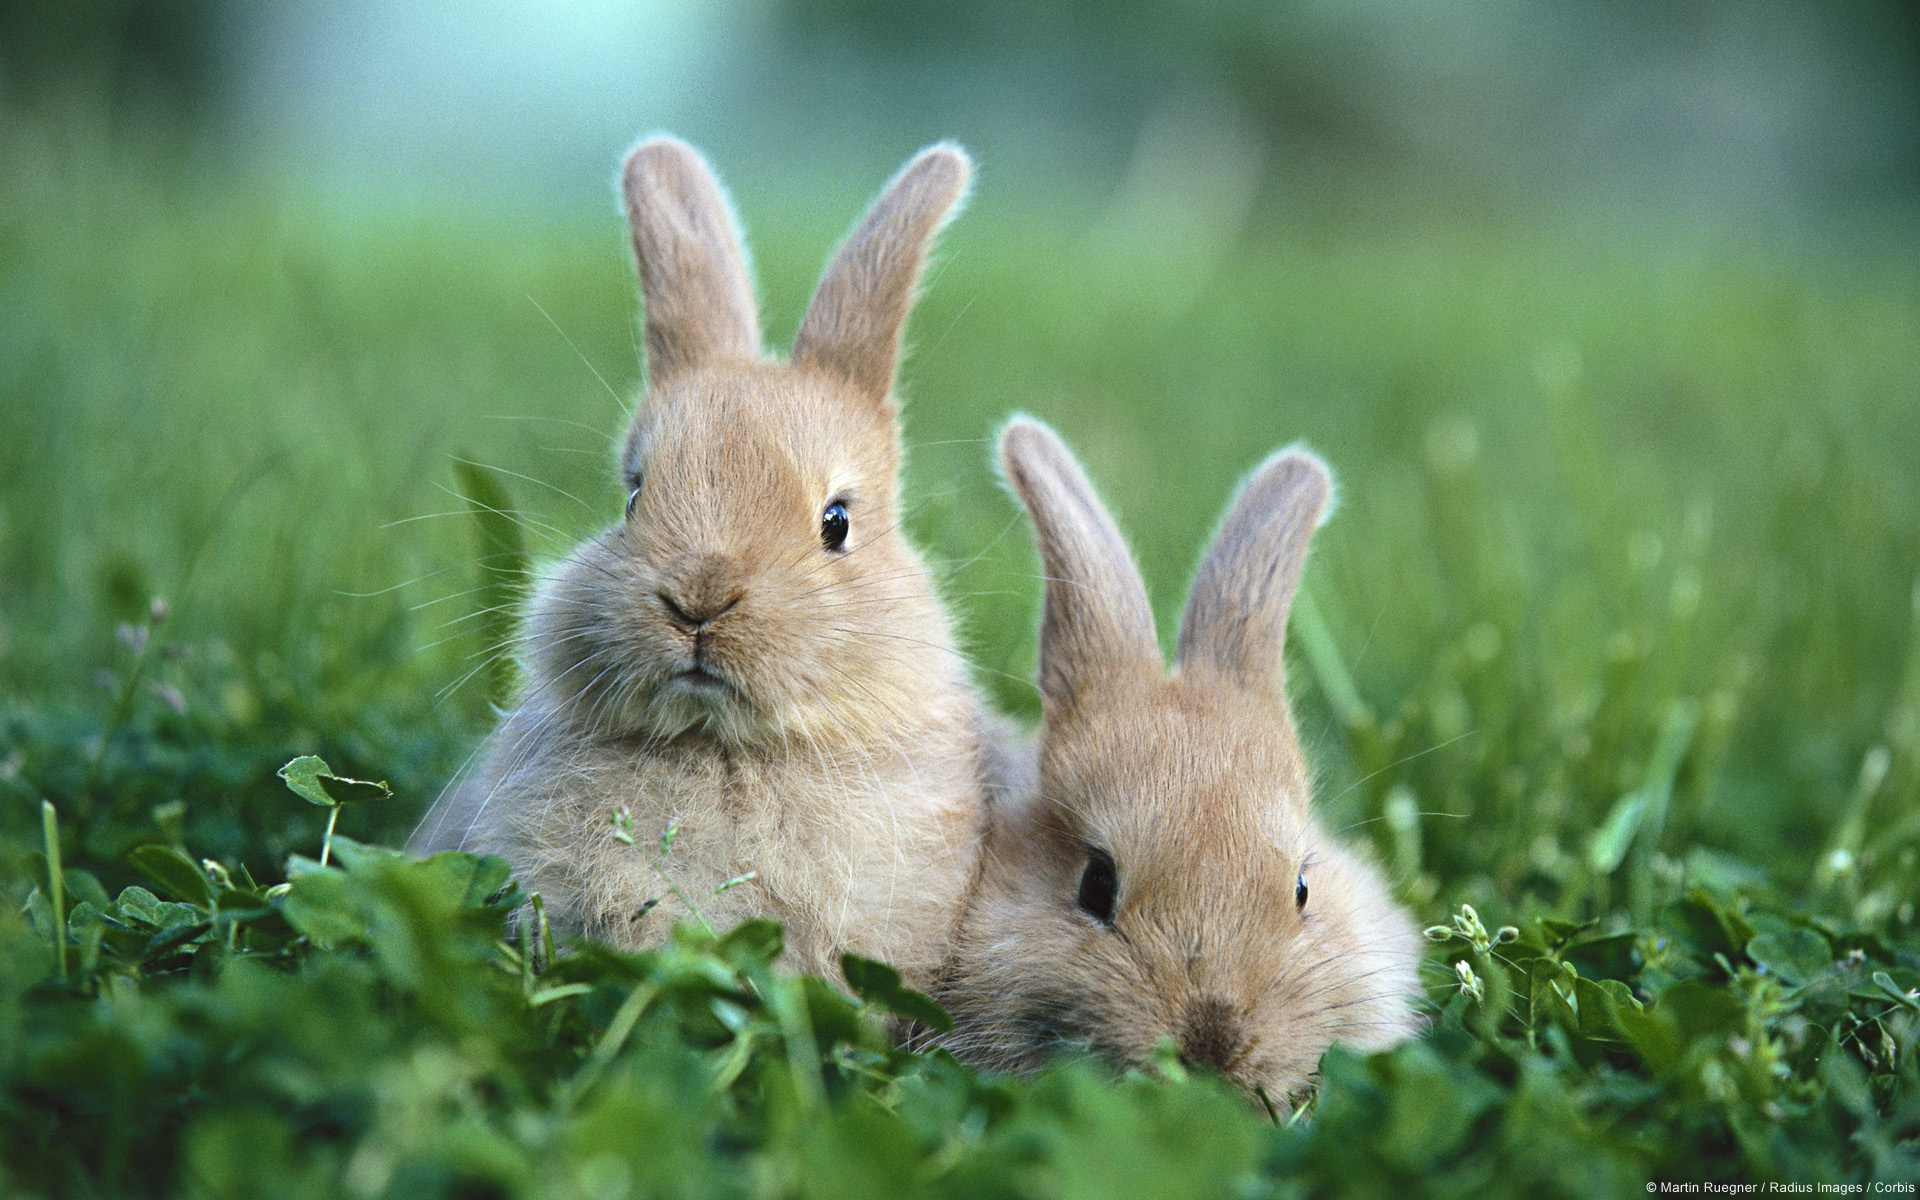 природа животные заяц nature animals hare  № 103296 загрузить